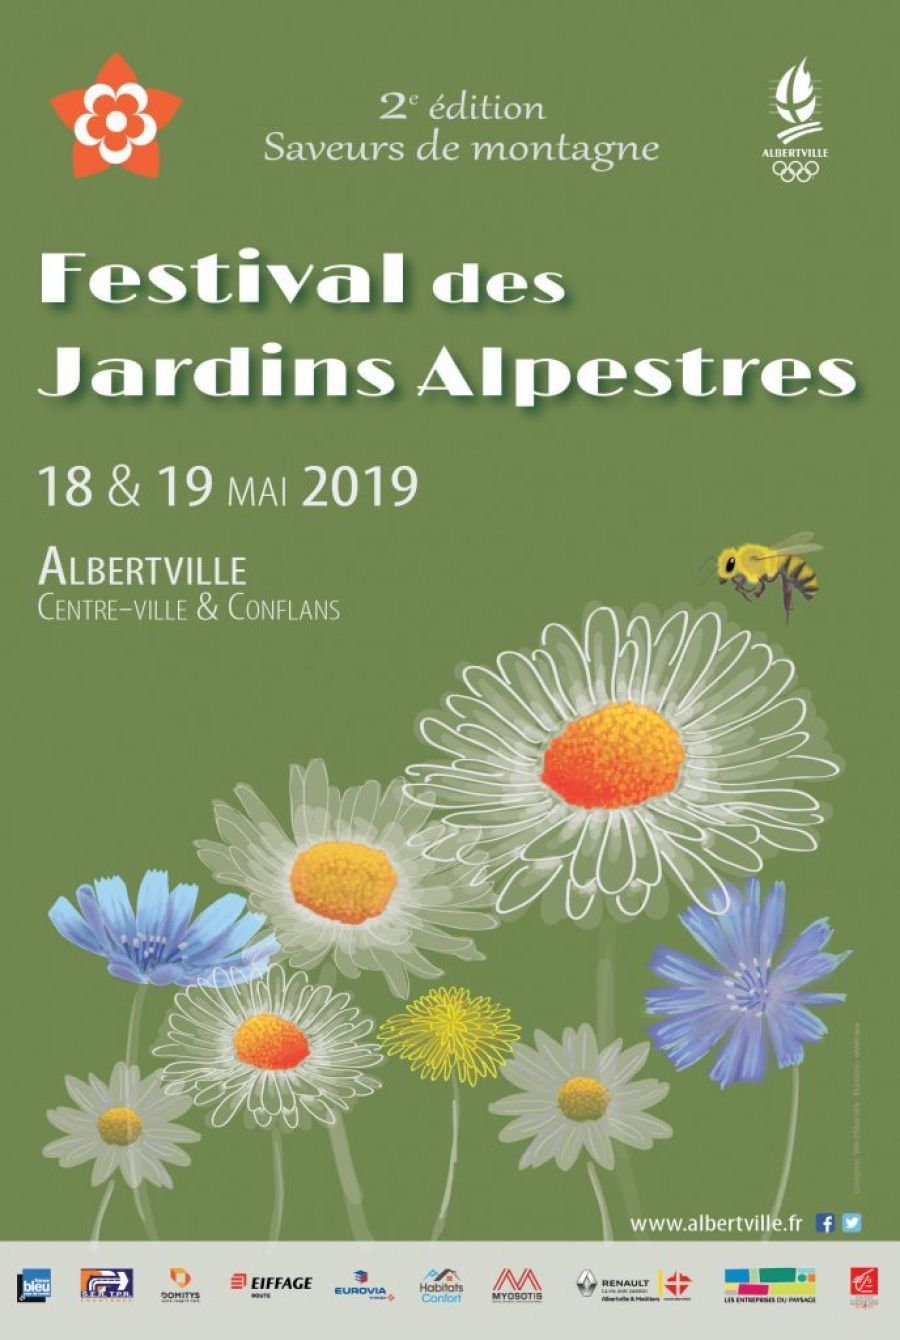 Festival des Jardins Alpestres